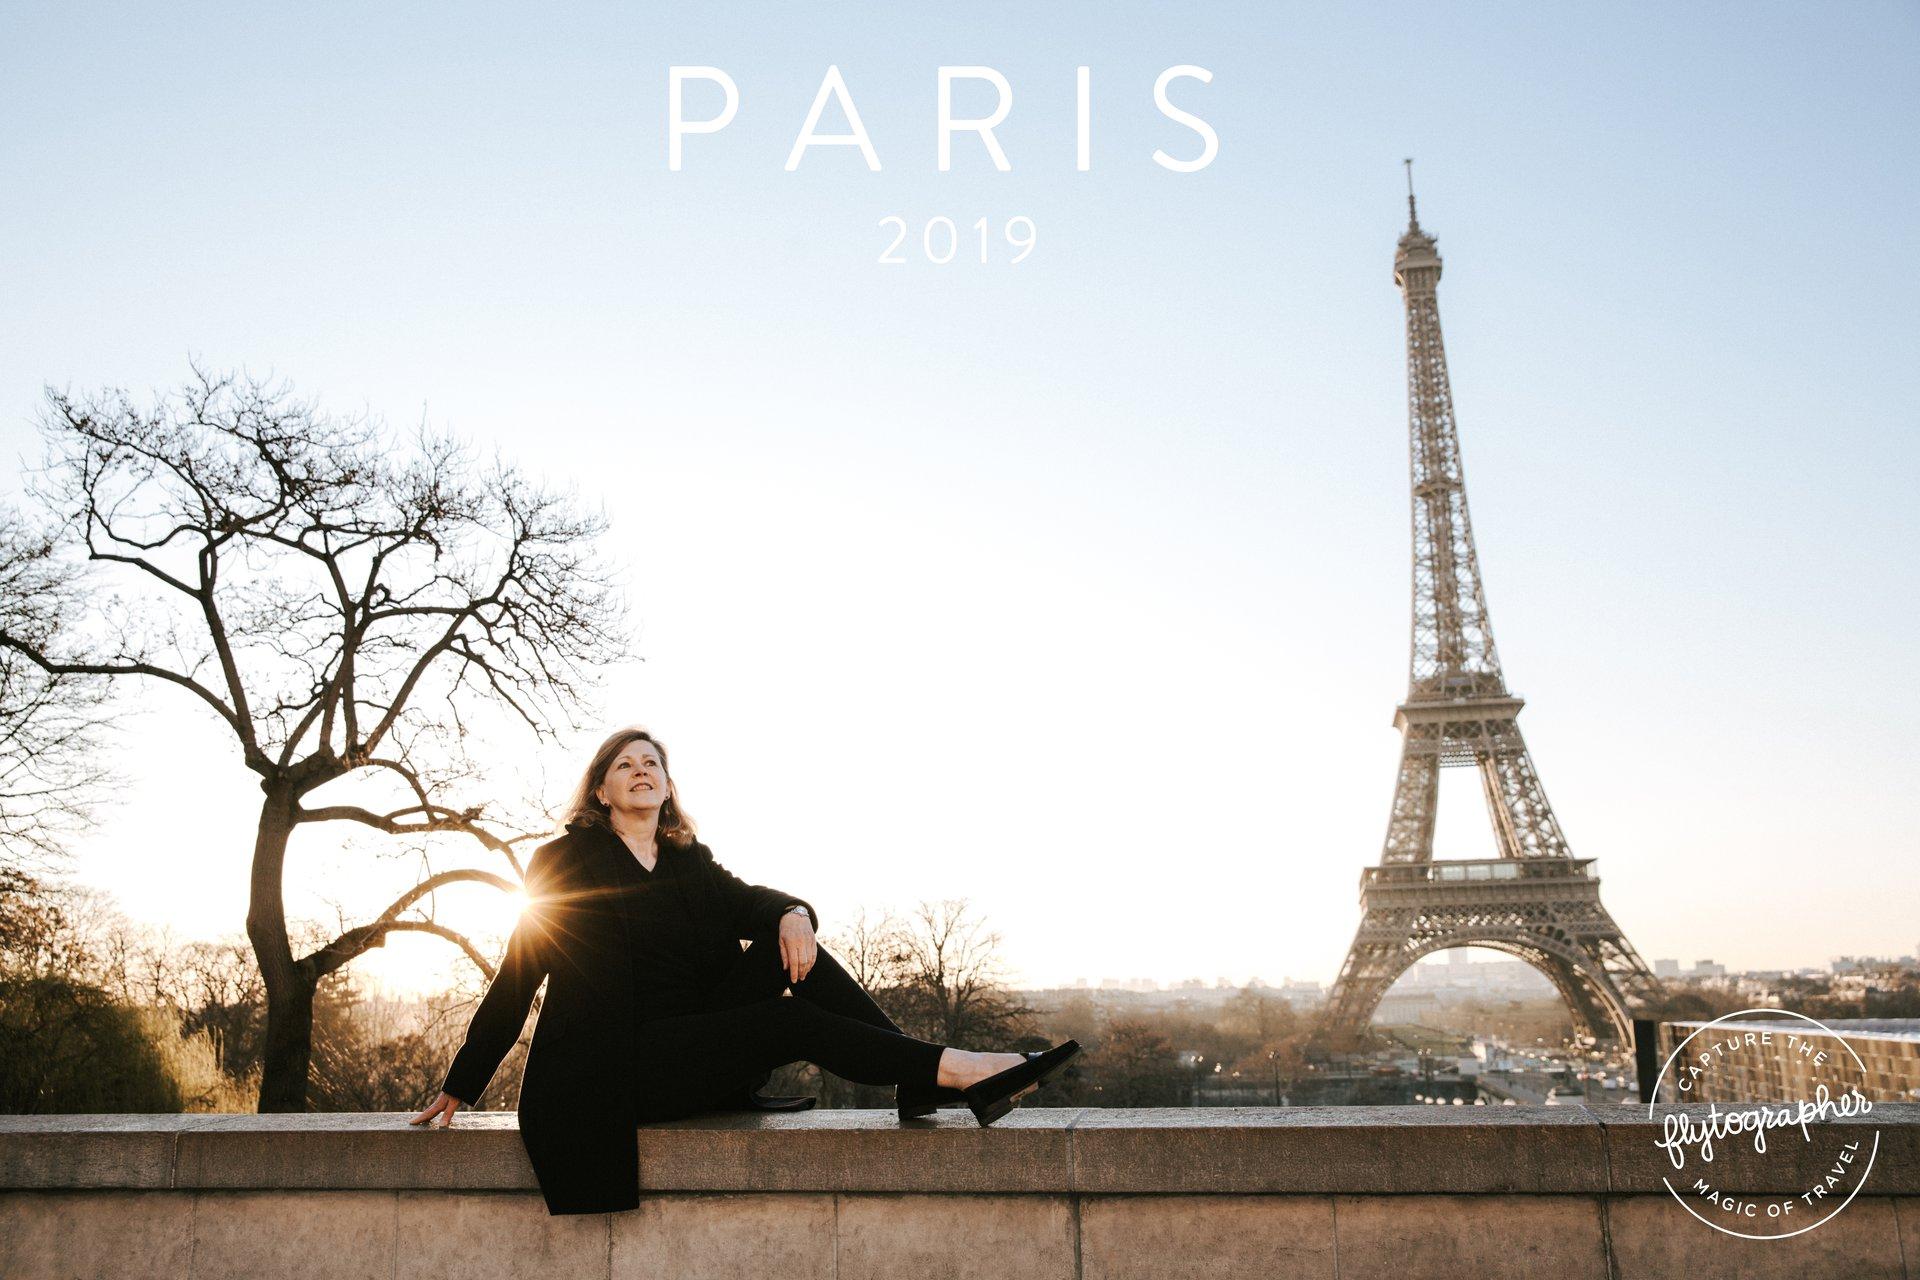 Flytographer Travel Story - Paris